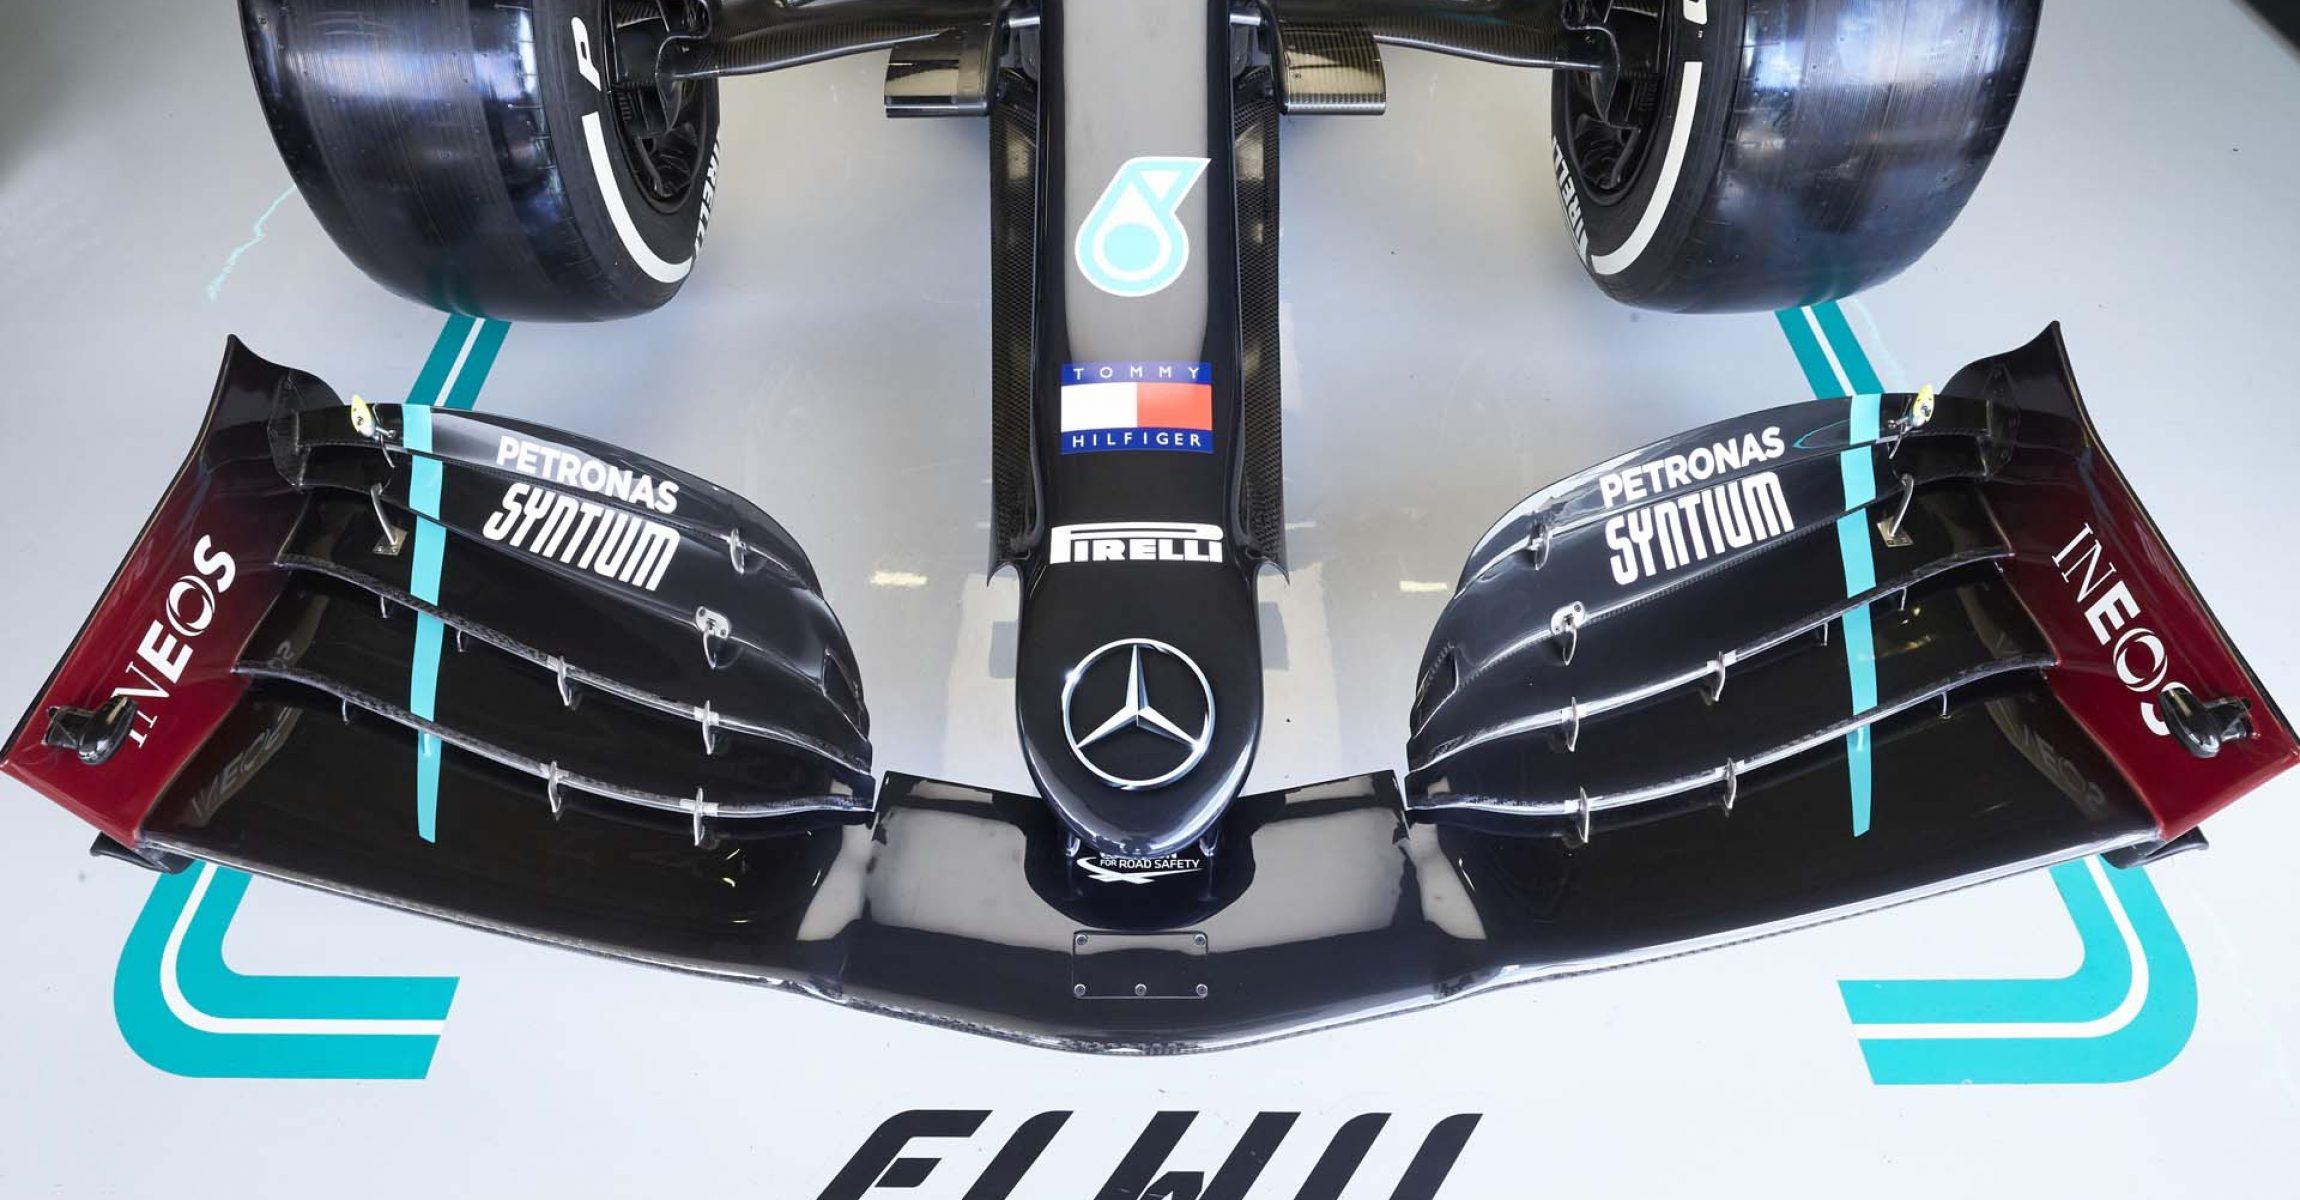 2020 Austrian Grand Prix, Thursday - Steve Etherington Mercedes